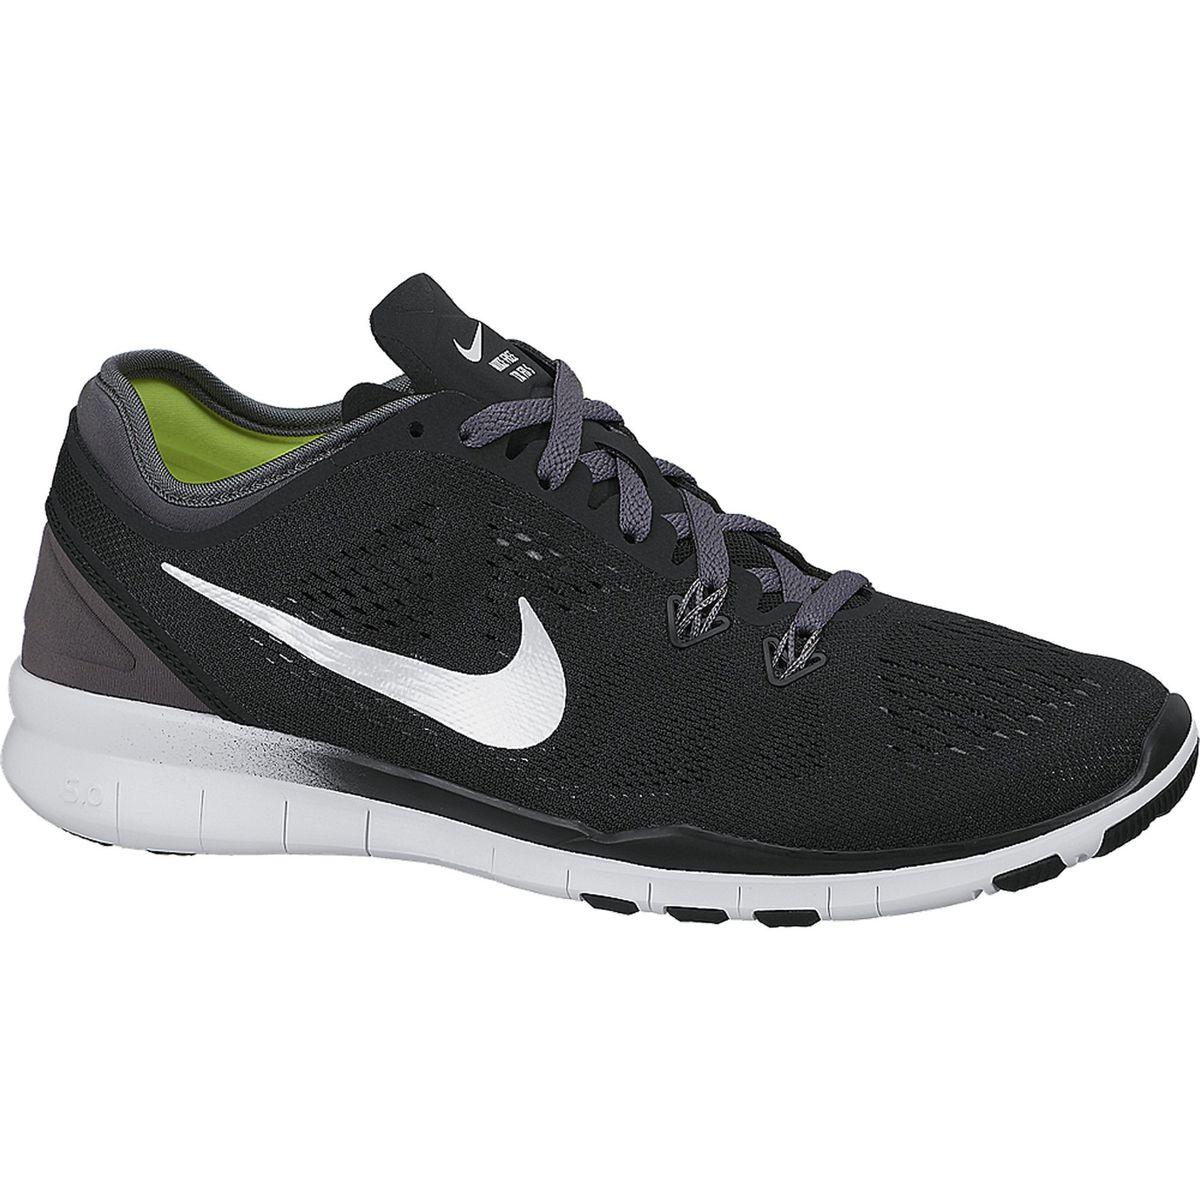 Nike Free 5.0 Tr 5 Impression Correspondent Ukelele